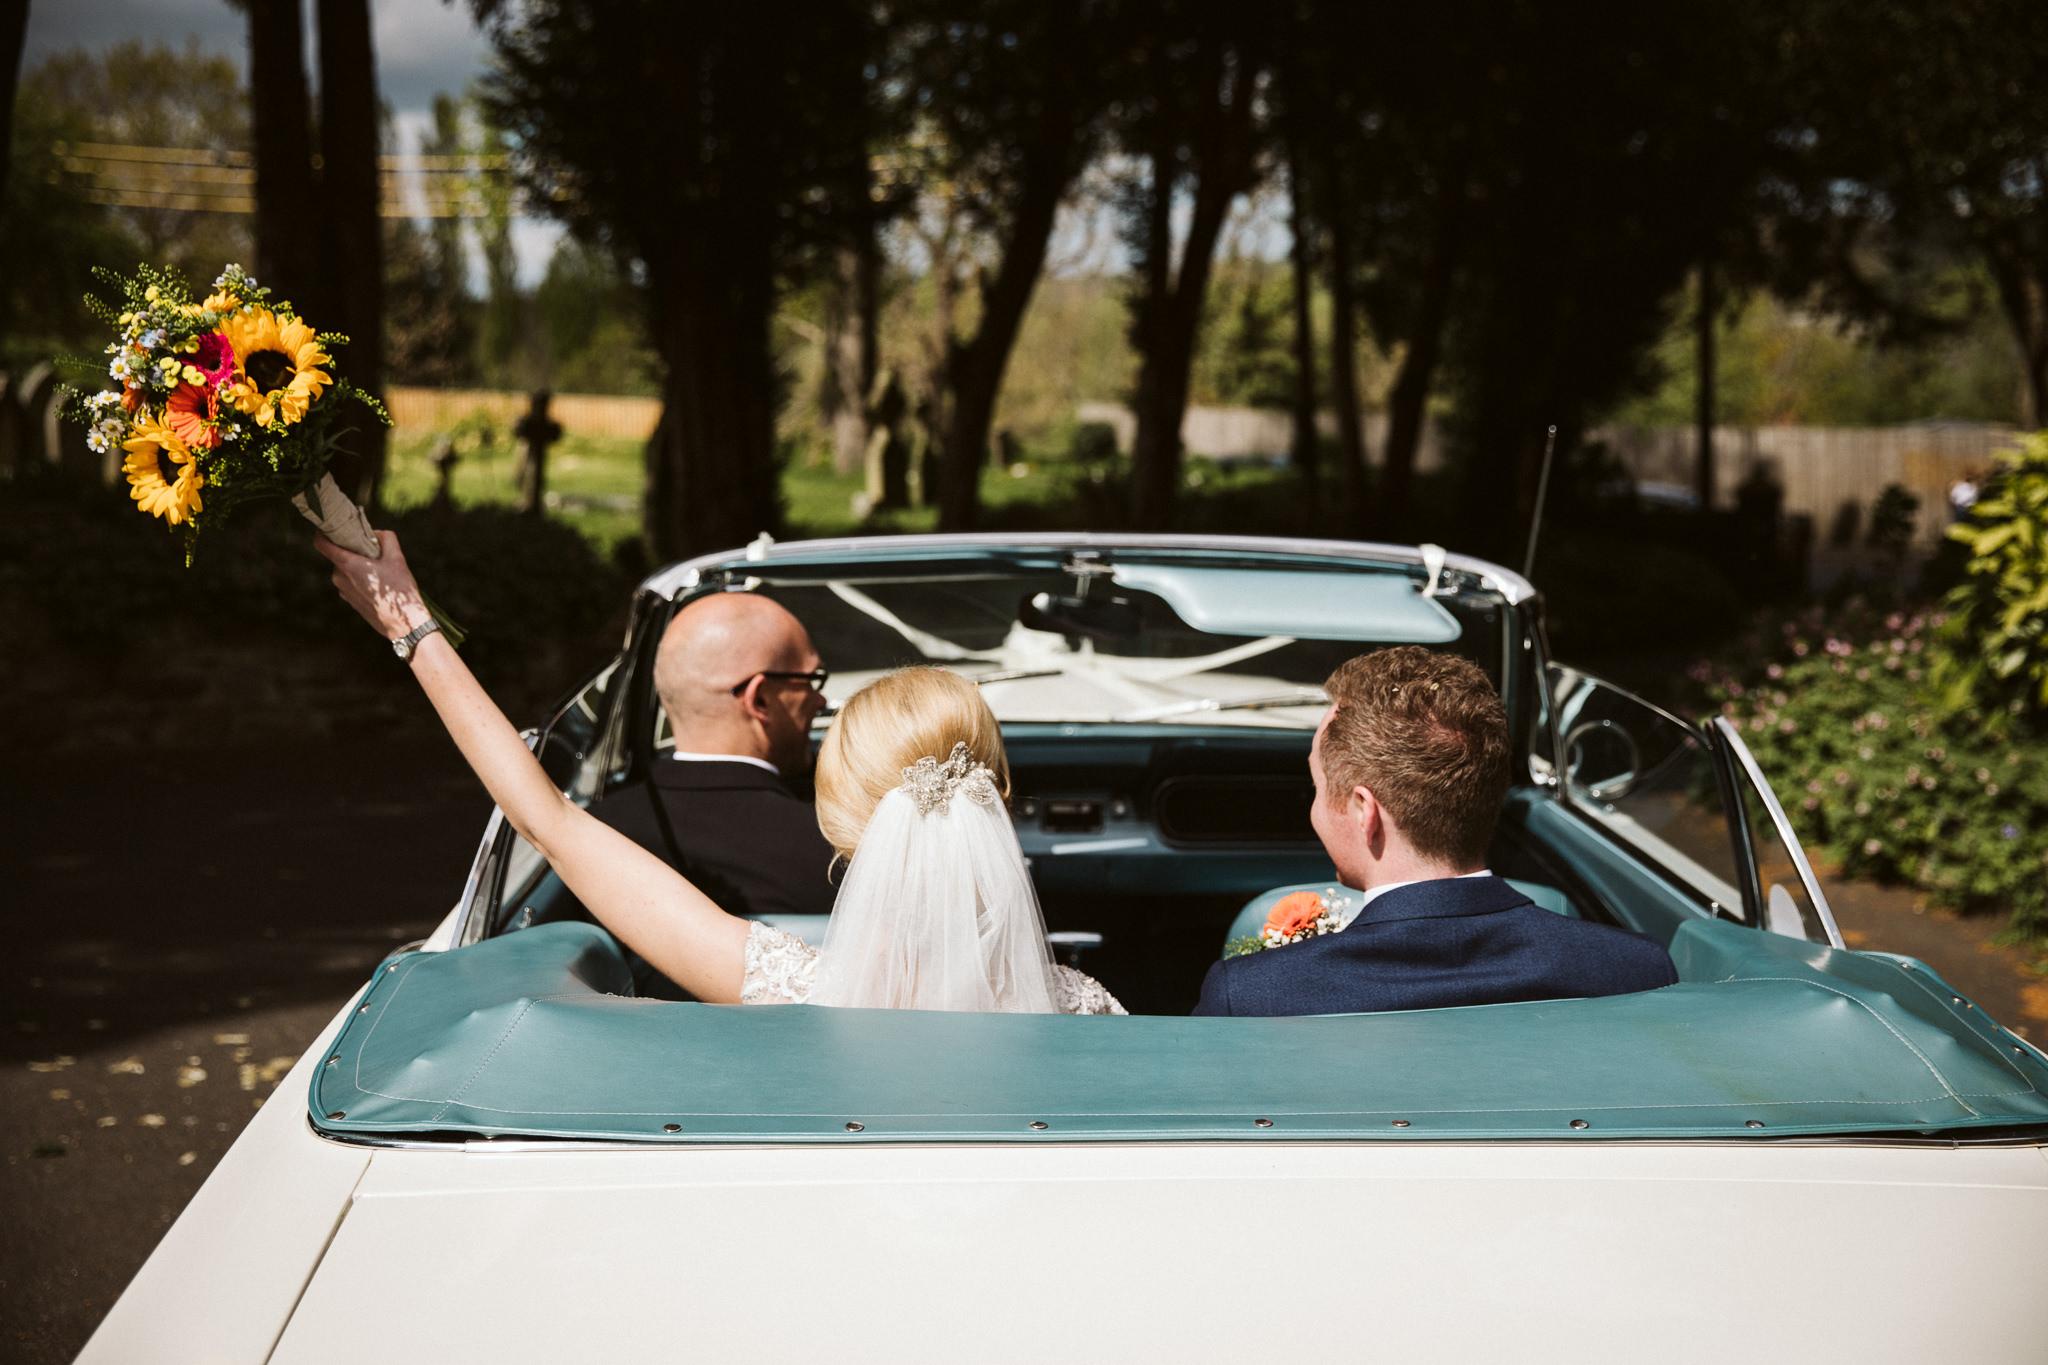 northside-farm-wedding-northumberland-margarita-hope (41).jpg